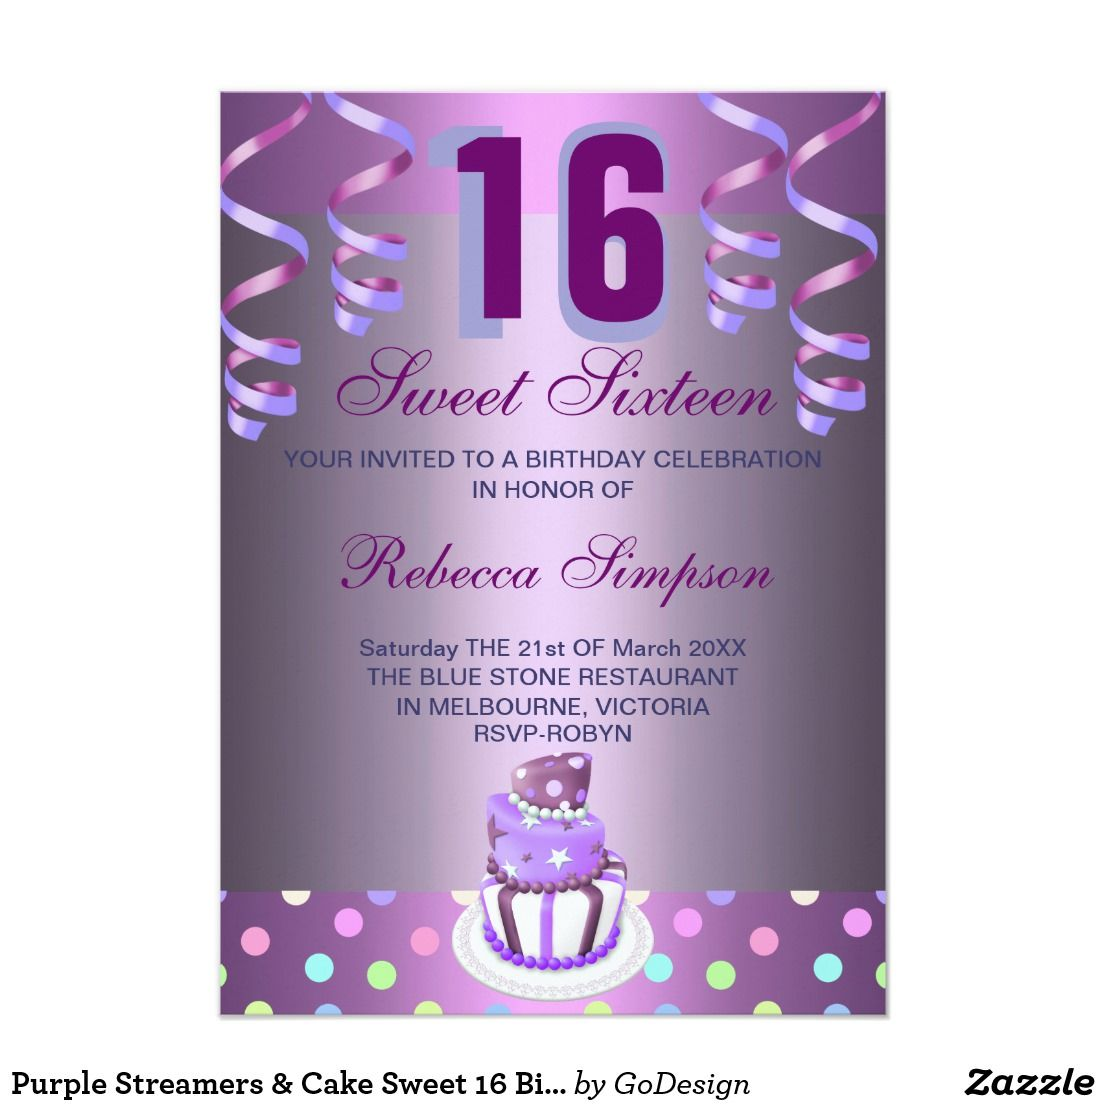 Purple Streamers & Cake Sweet 16 Birthday Invite Modern Purple ...